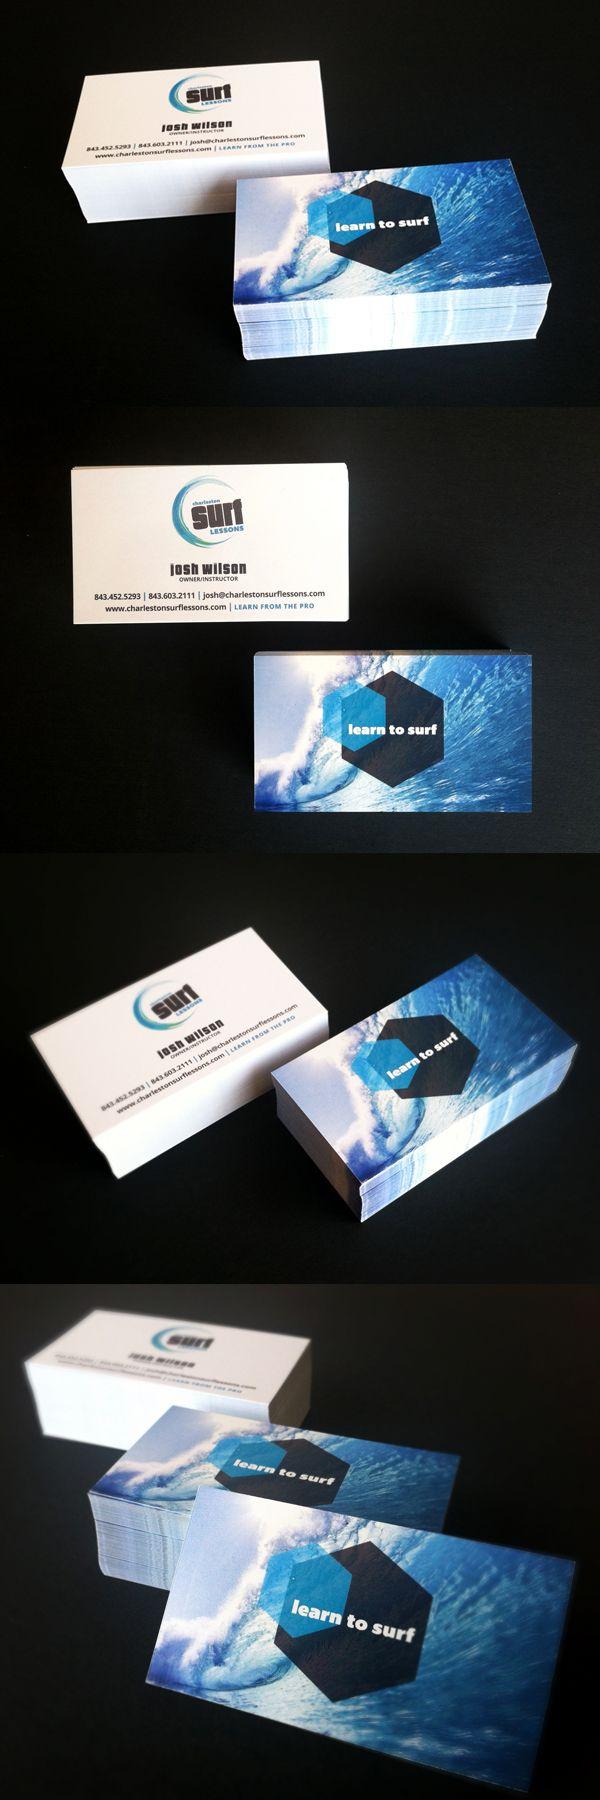 Charleston Surf Lessons - DesAutels Designs | business card design | www.charlestonsurflessons.com